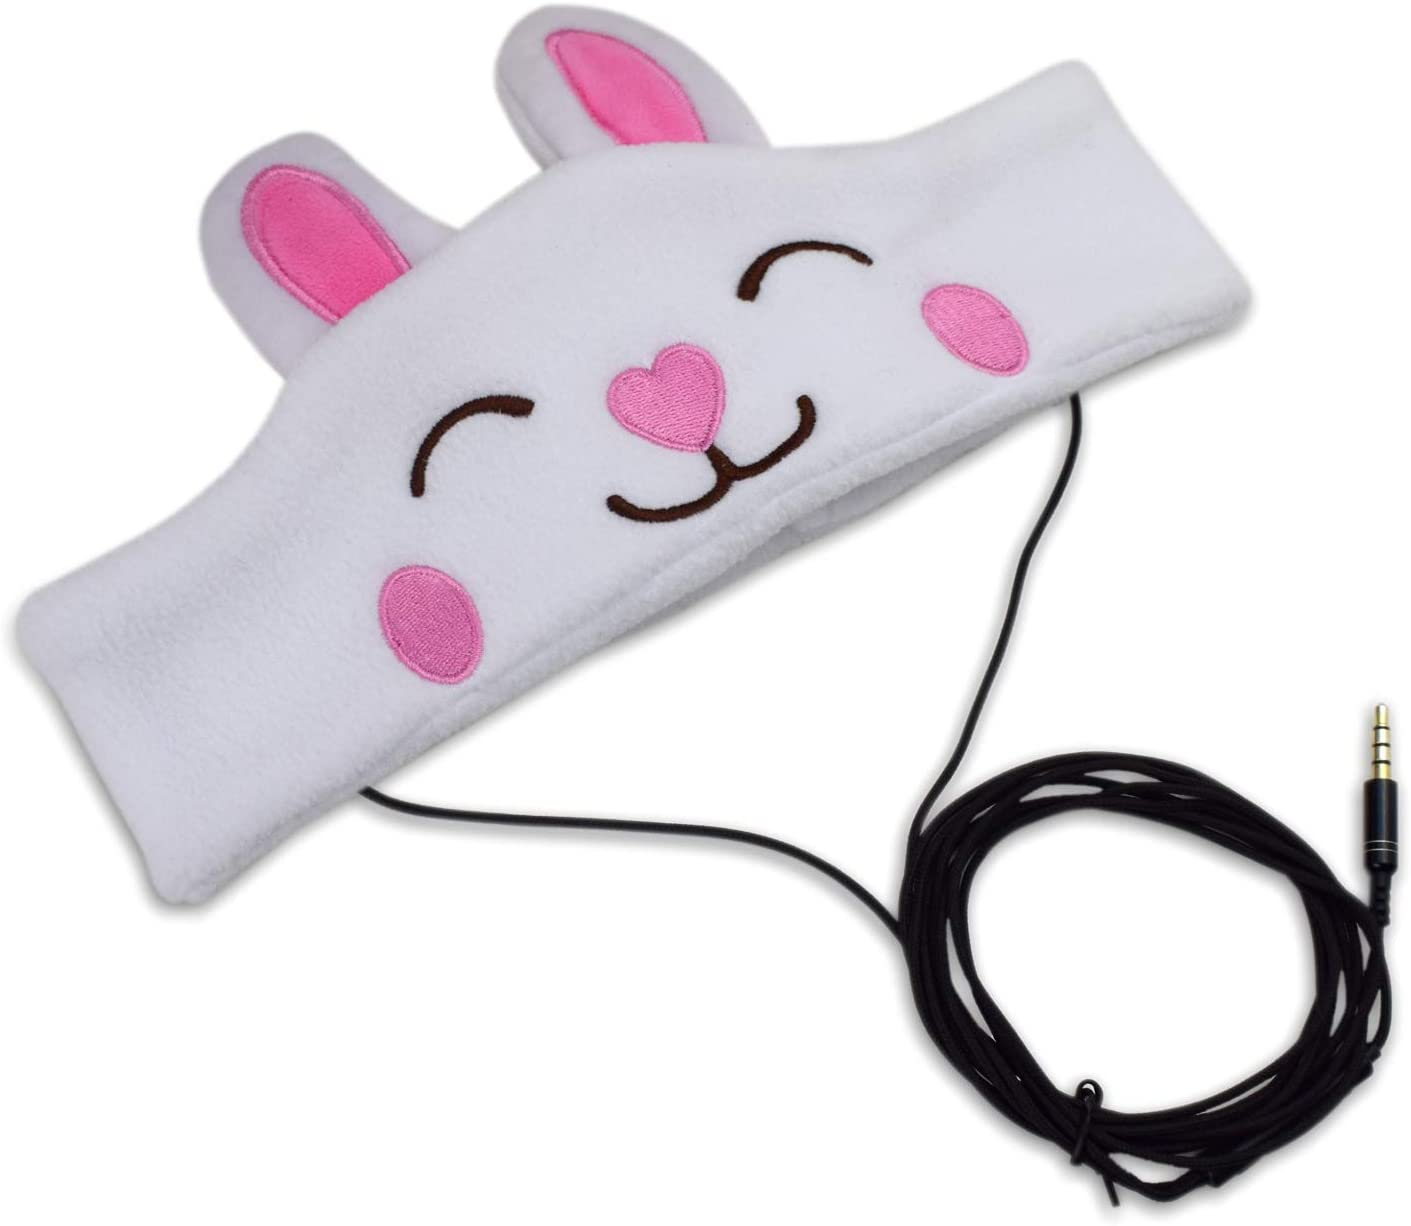 Contixo H1 Kids Headphones